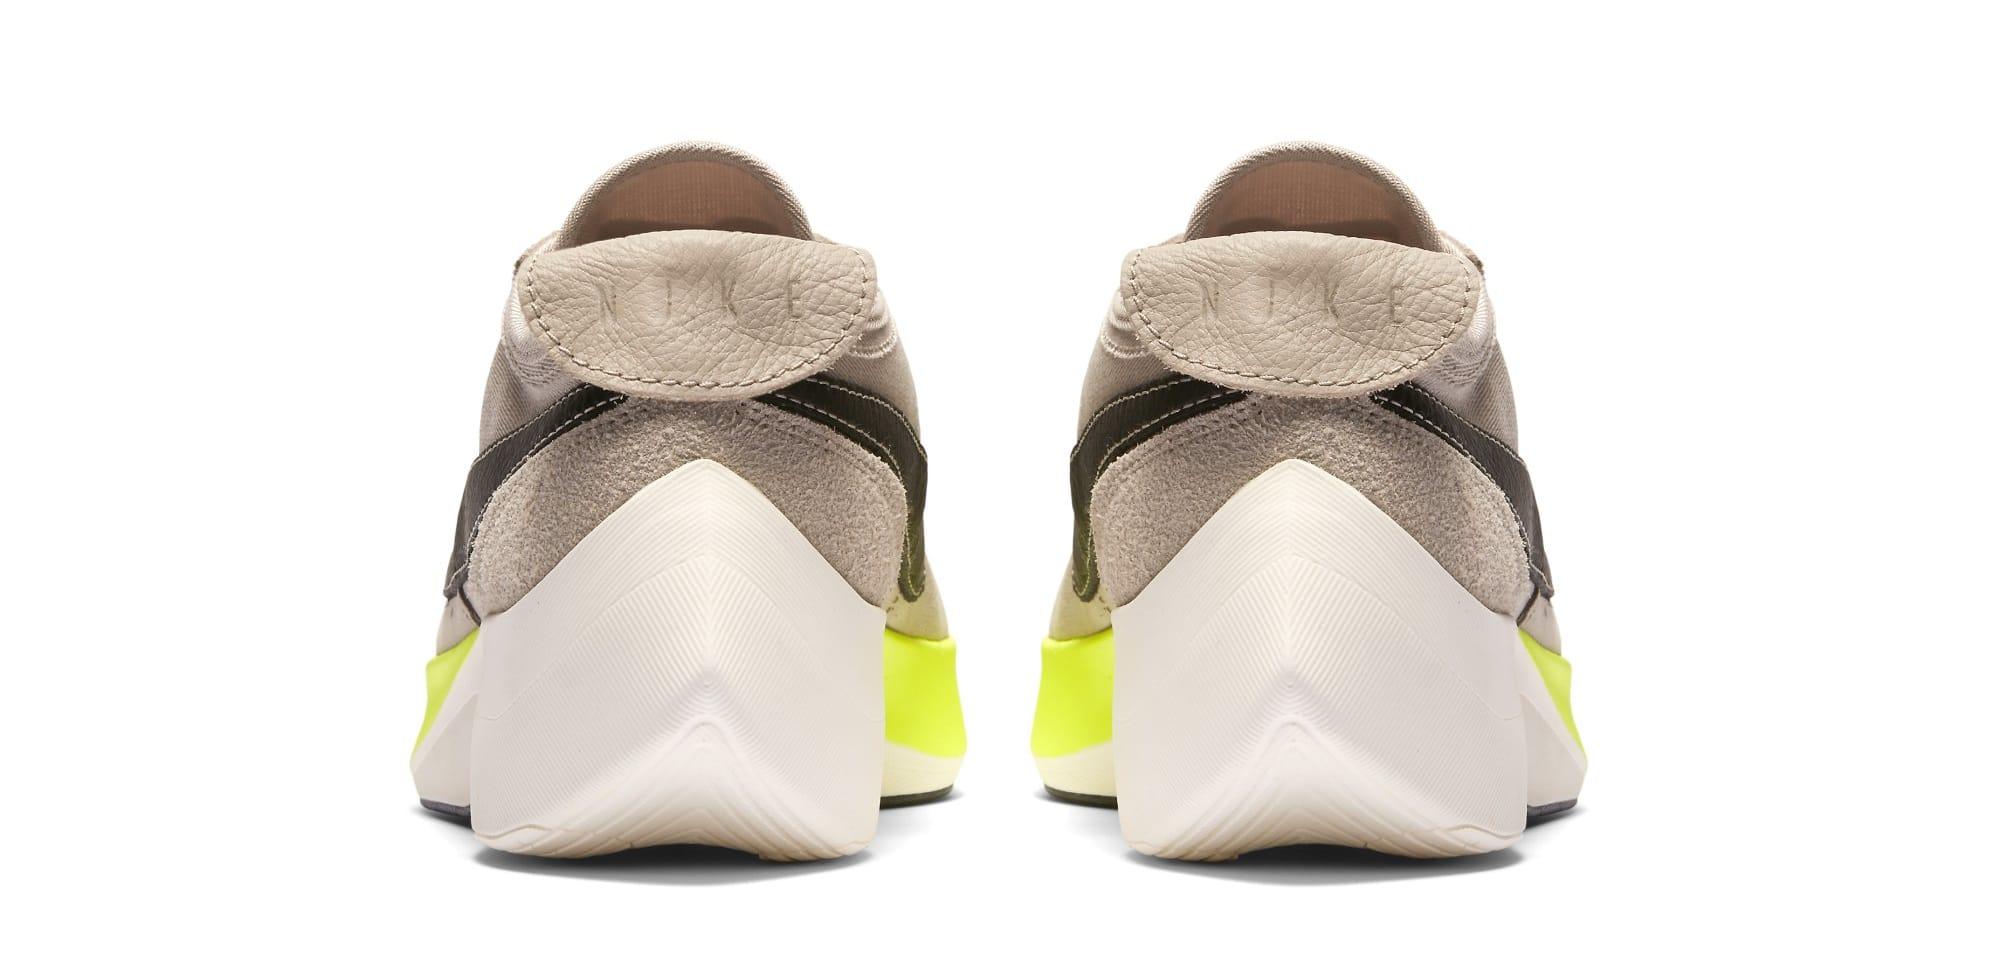 Nike Moon Racer 'Black/Sail/Volt' AQ4121-200 (Heel)